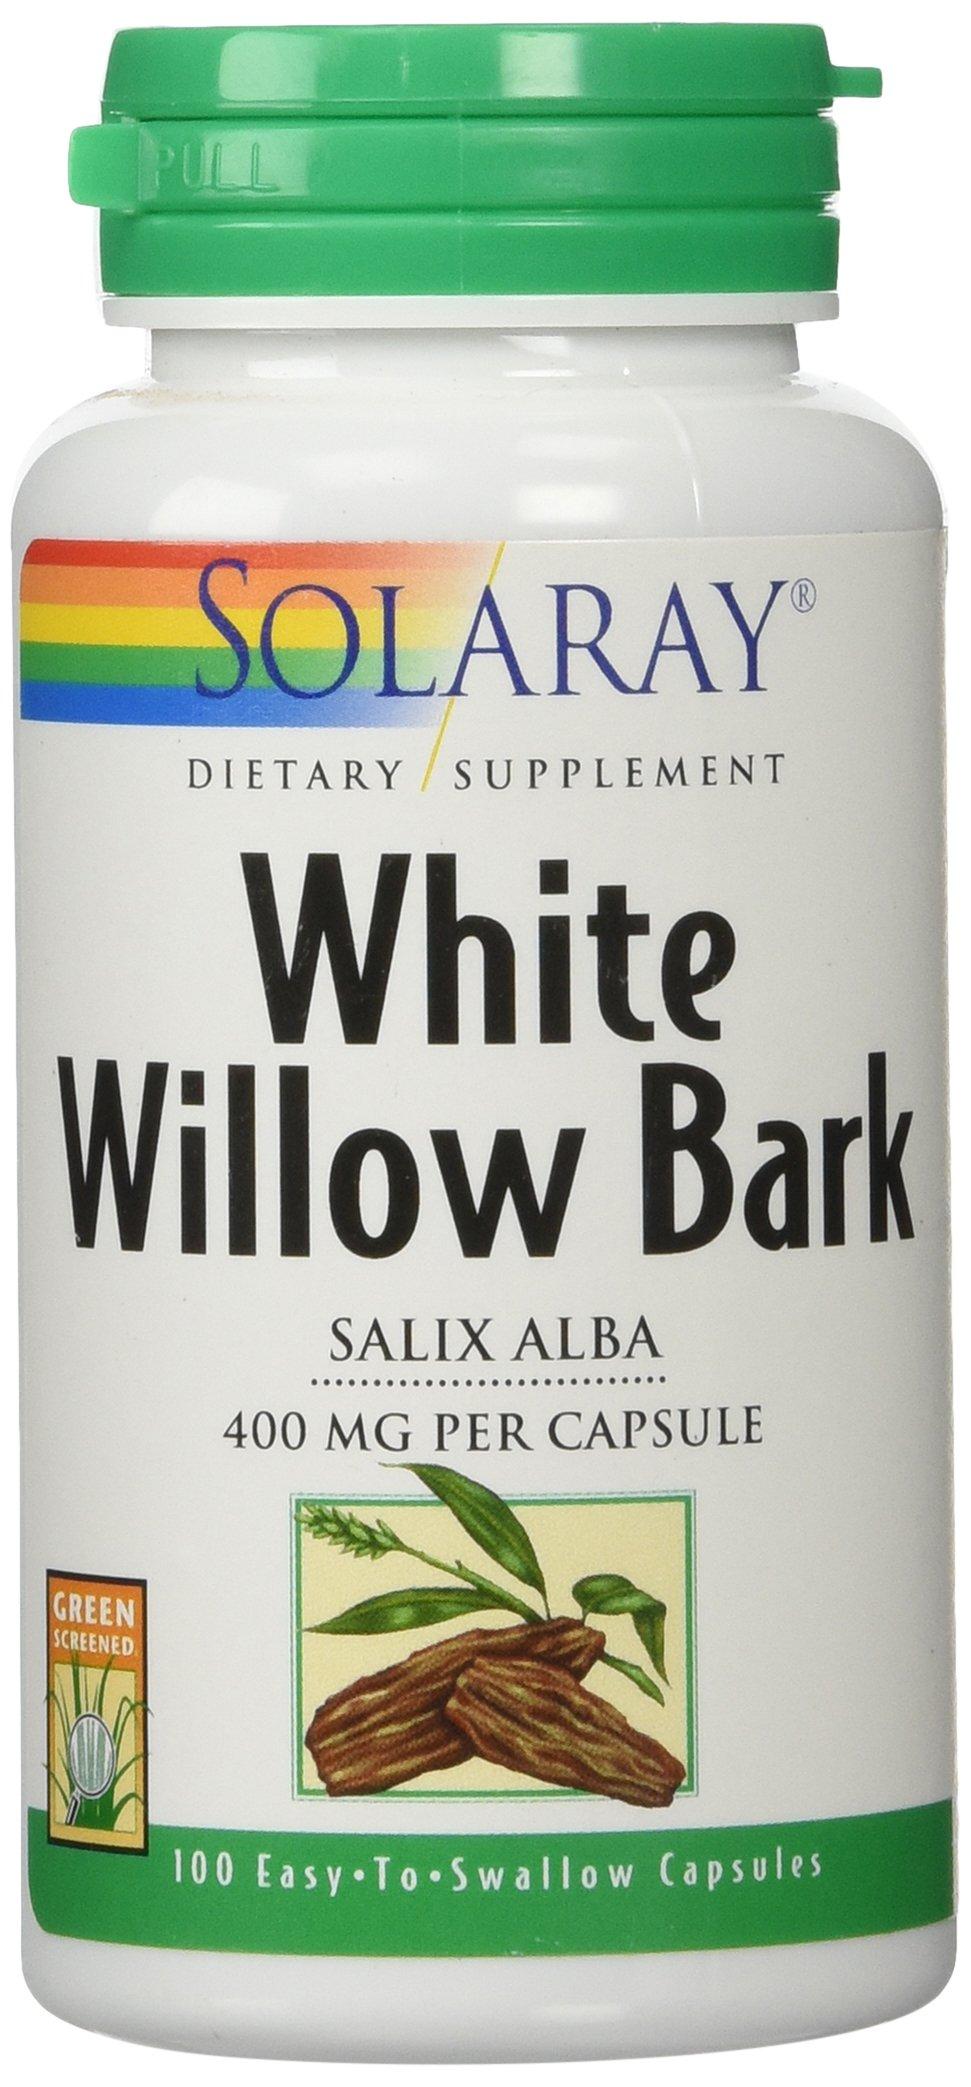 Solaray White Willow Bark Capsules, 400 mg, 100 Count